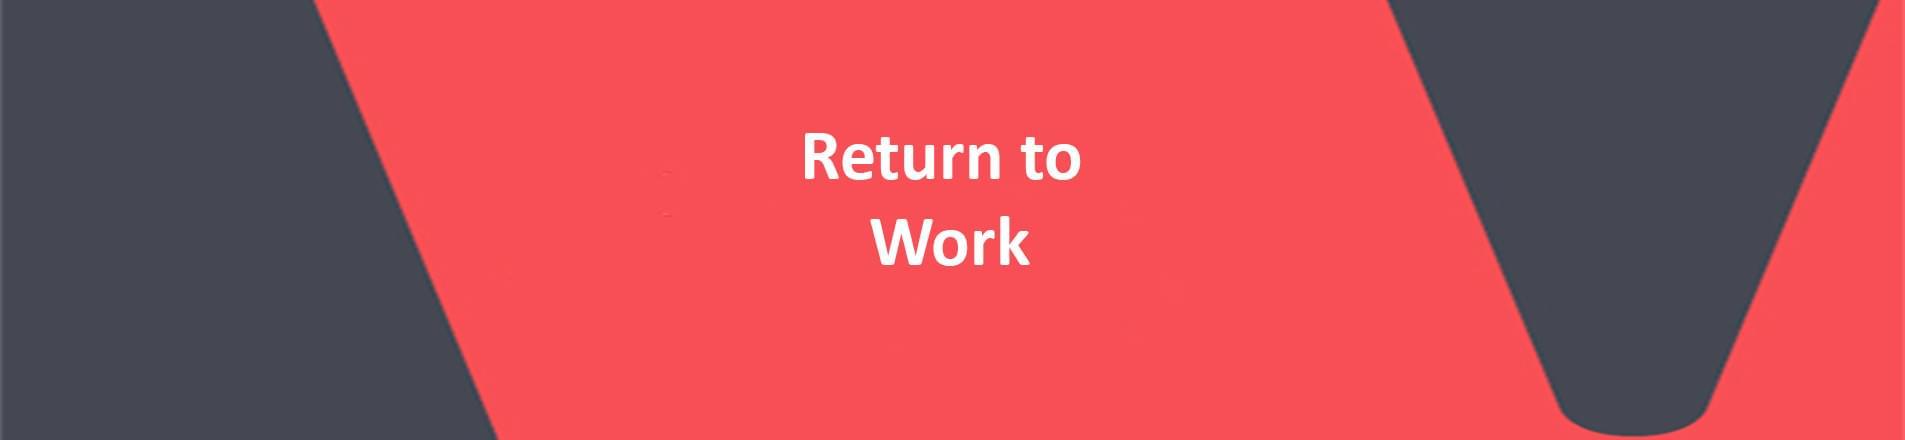 Title Return to work on red VERCIDA branded background